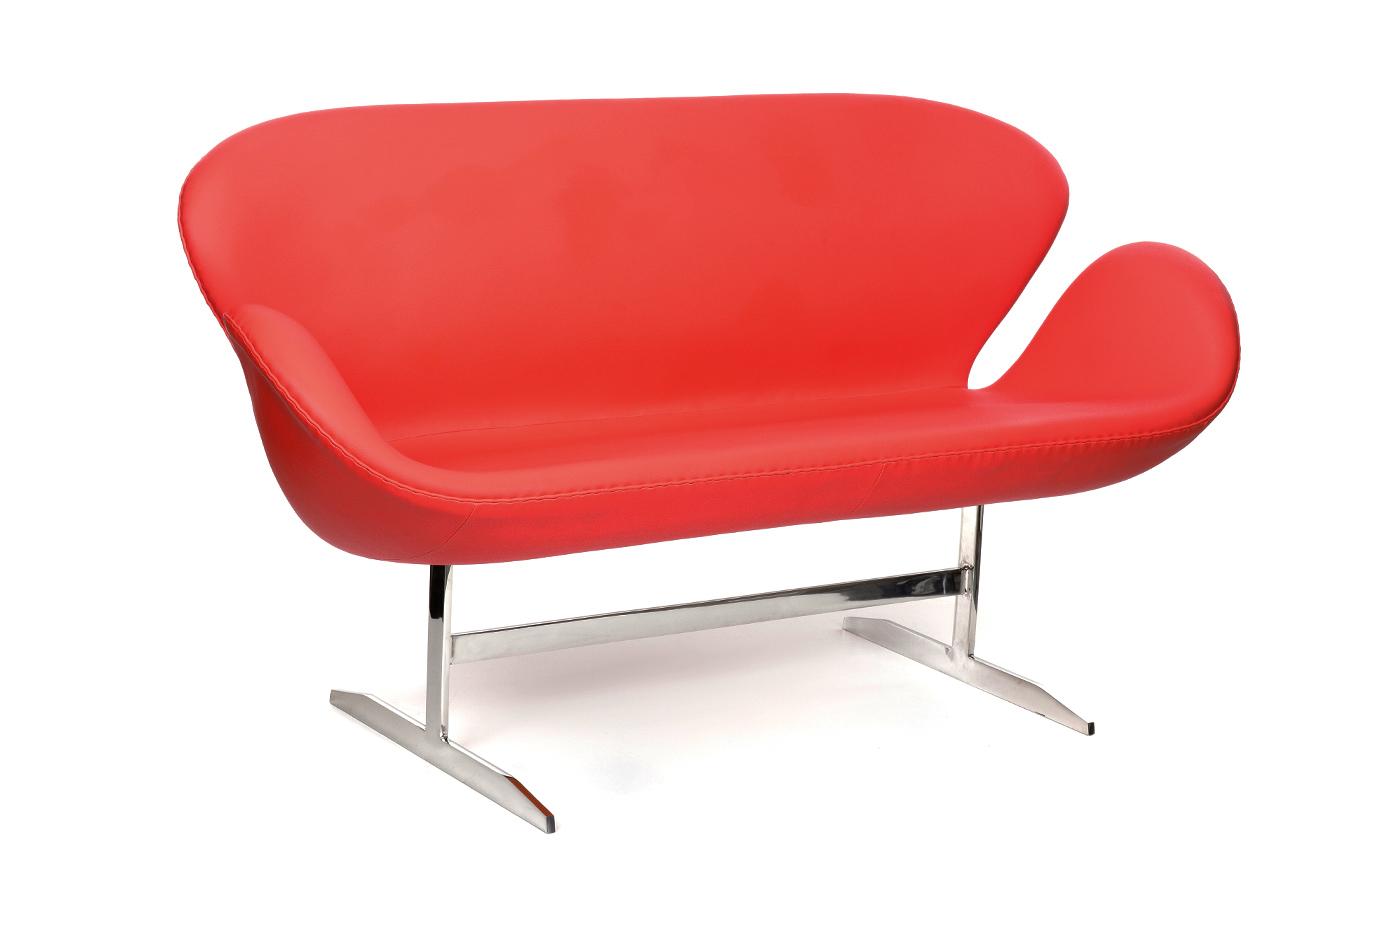 Unikalne Sofa MAGNAT Skóra Ekologiczna - zFABRYKI.PL YG25